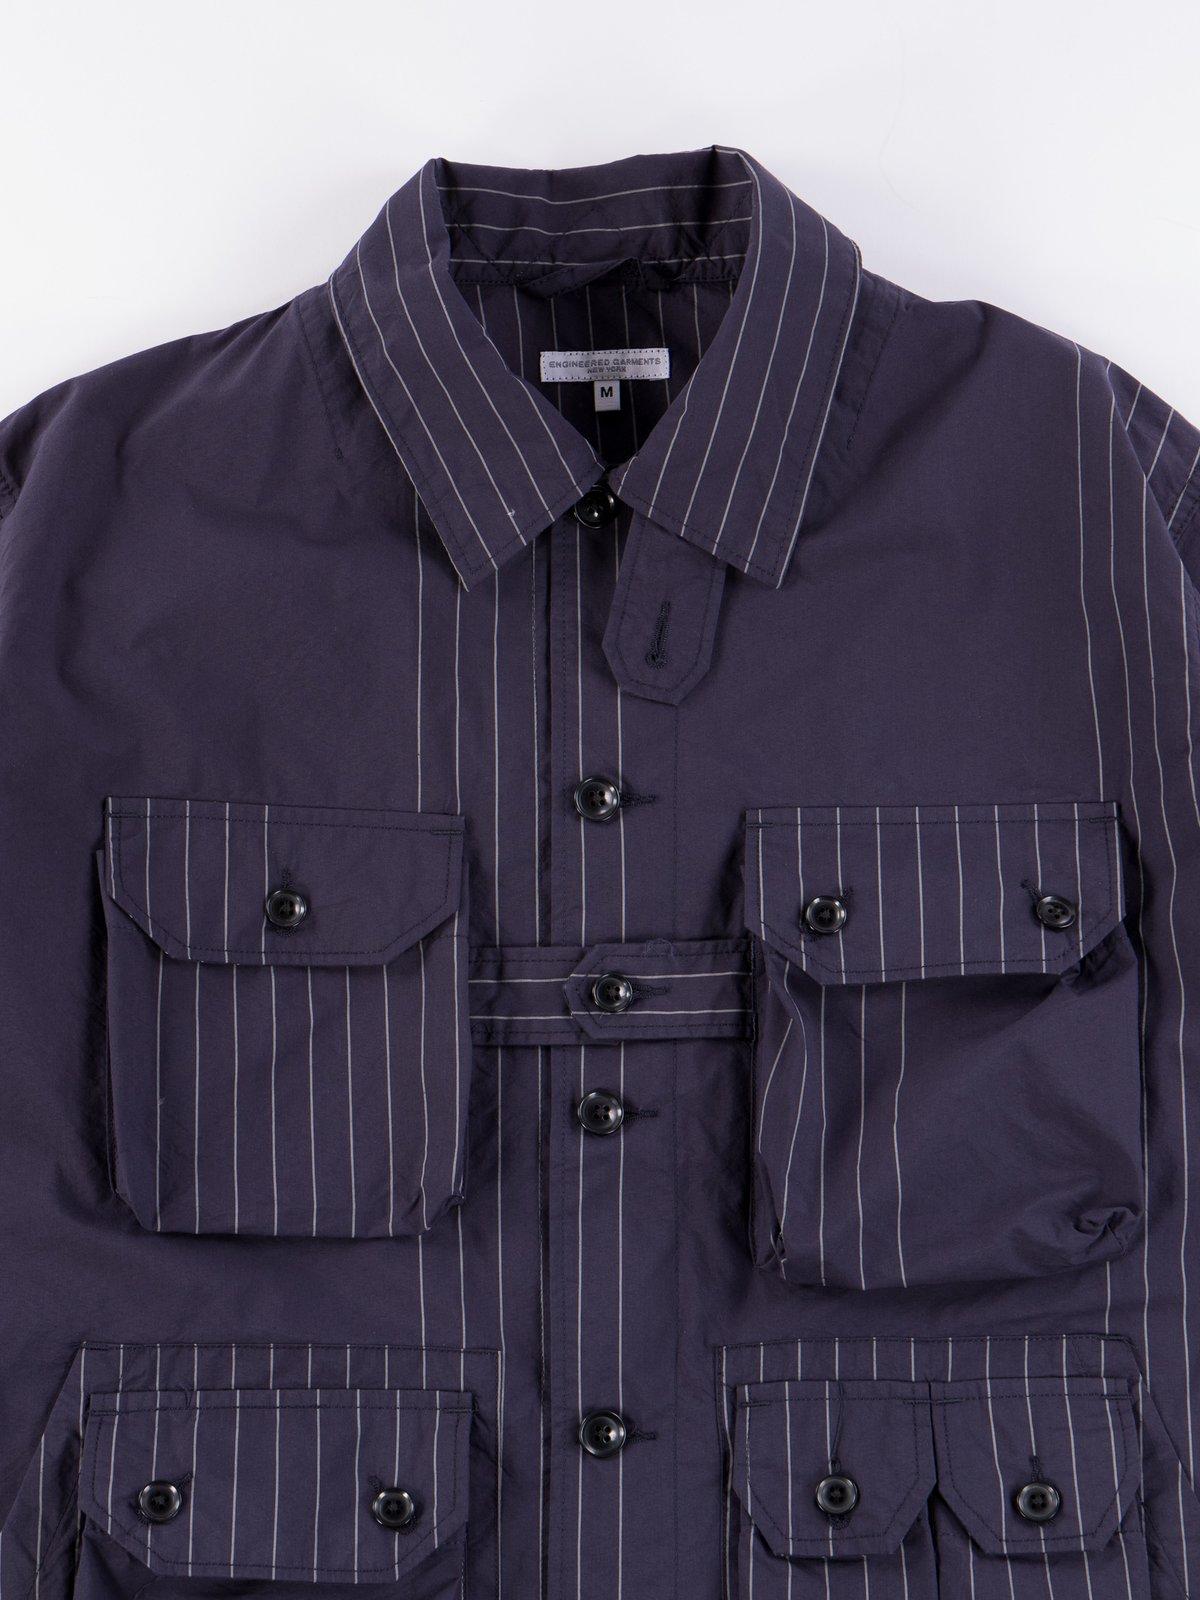 Dark Navy Nyco Gangster Stripe Explorer Shirt Jacket - Image 4